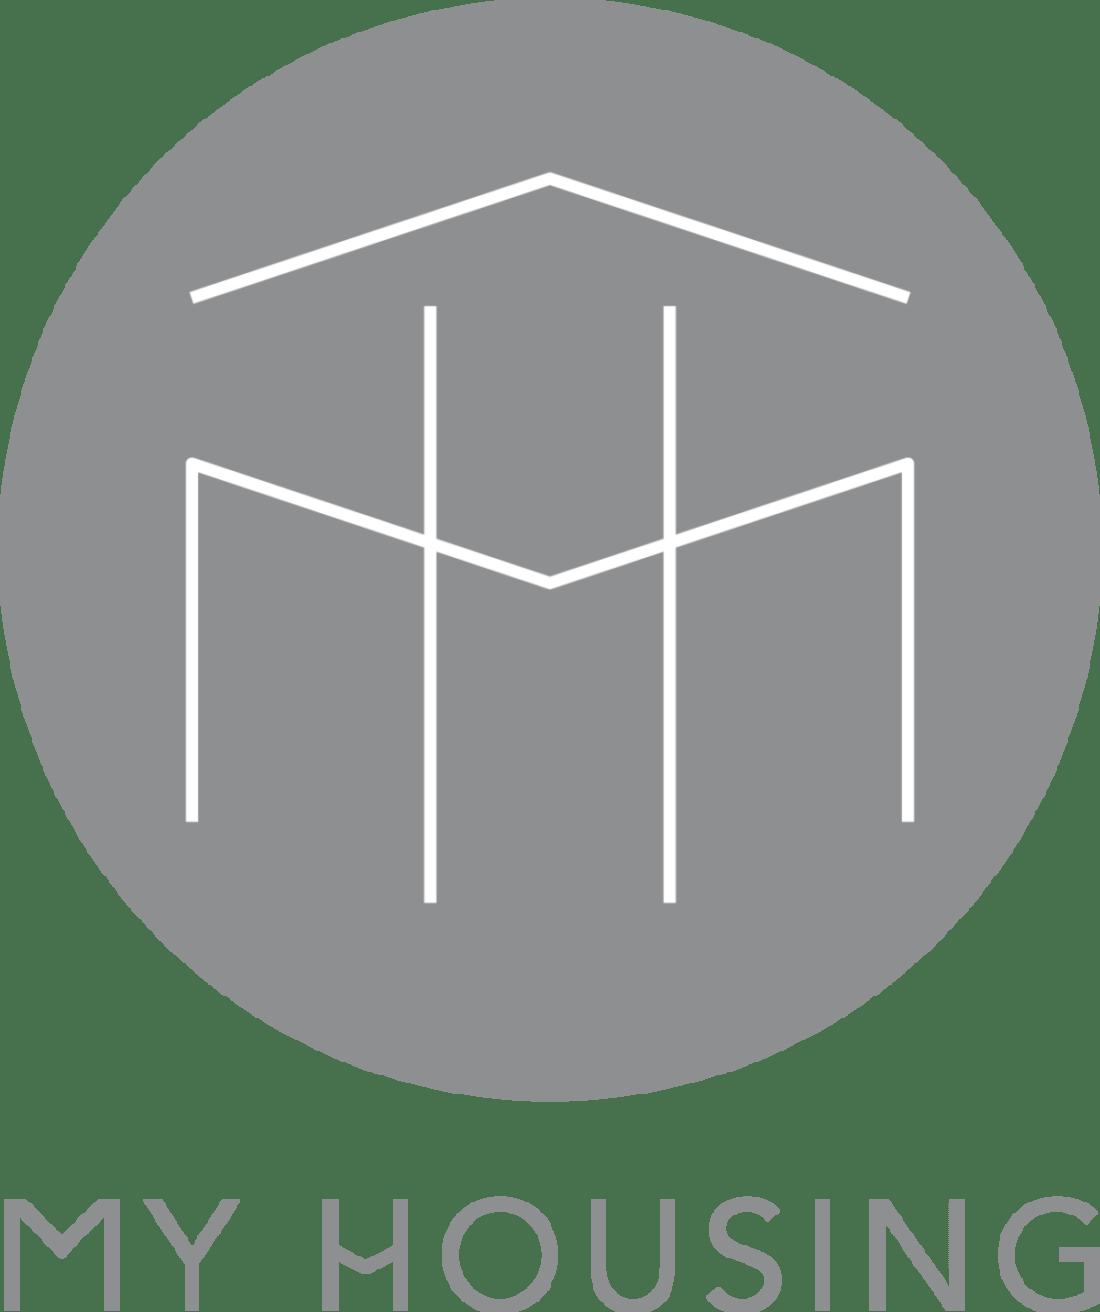 Myhousing